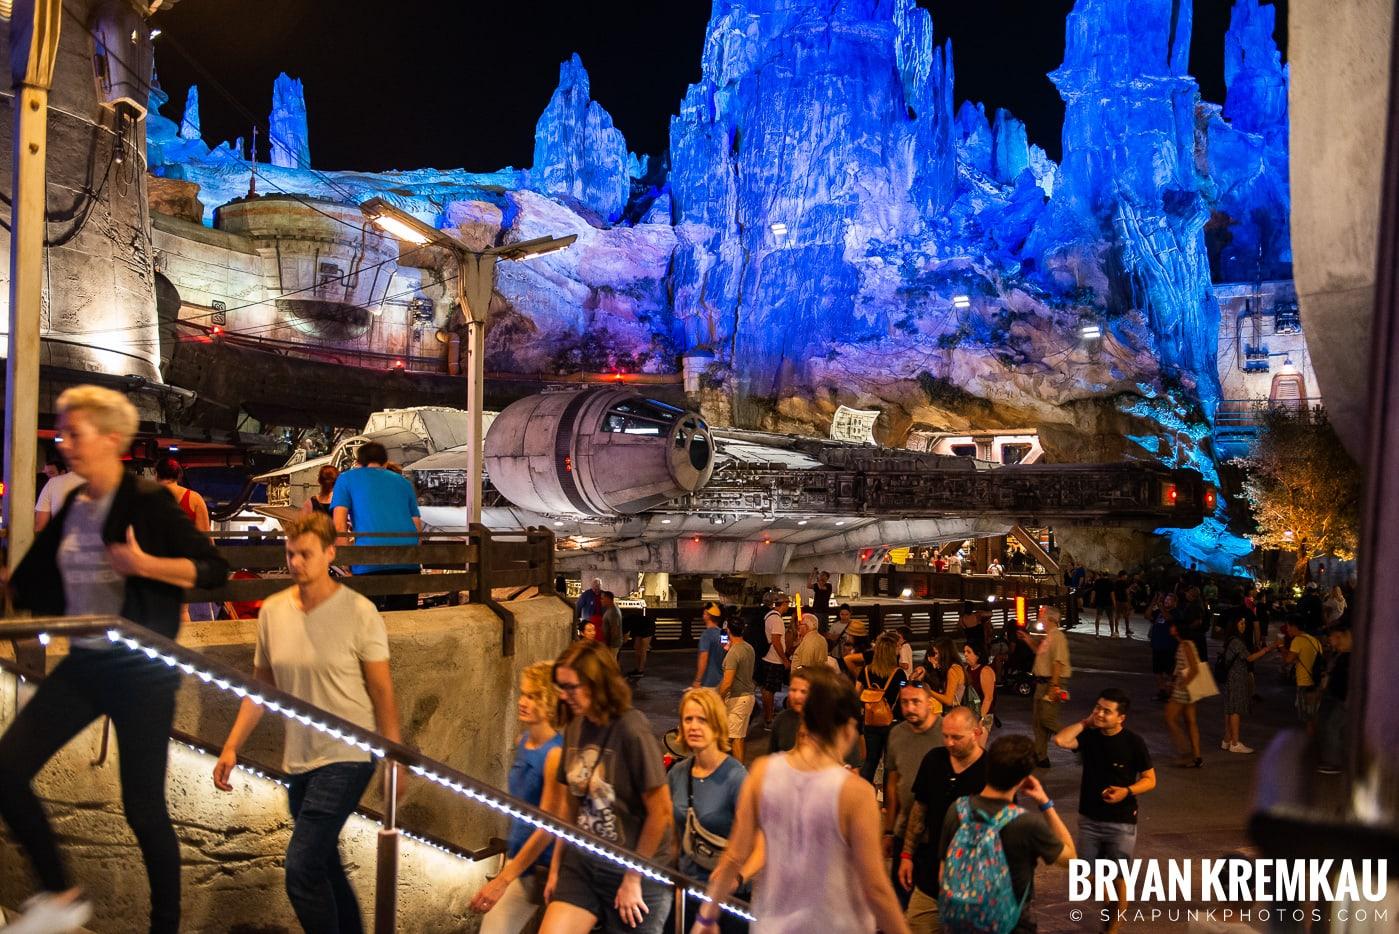 Walt Disney World Vacation: Day 5 (Animal Kingdom / Disney's Hollywood Studios) - 10.3.19 (23)